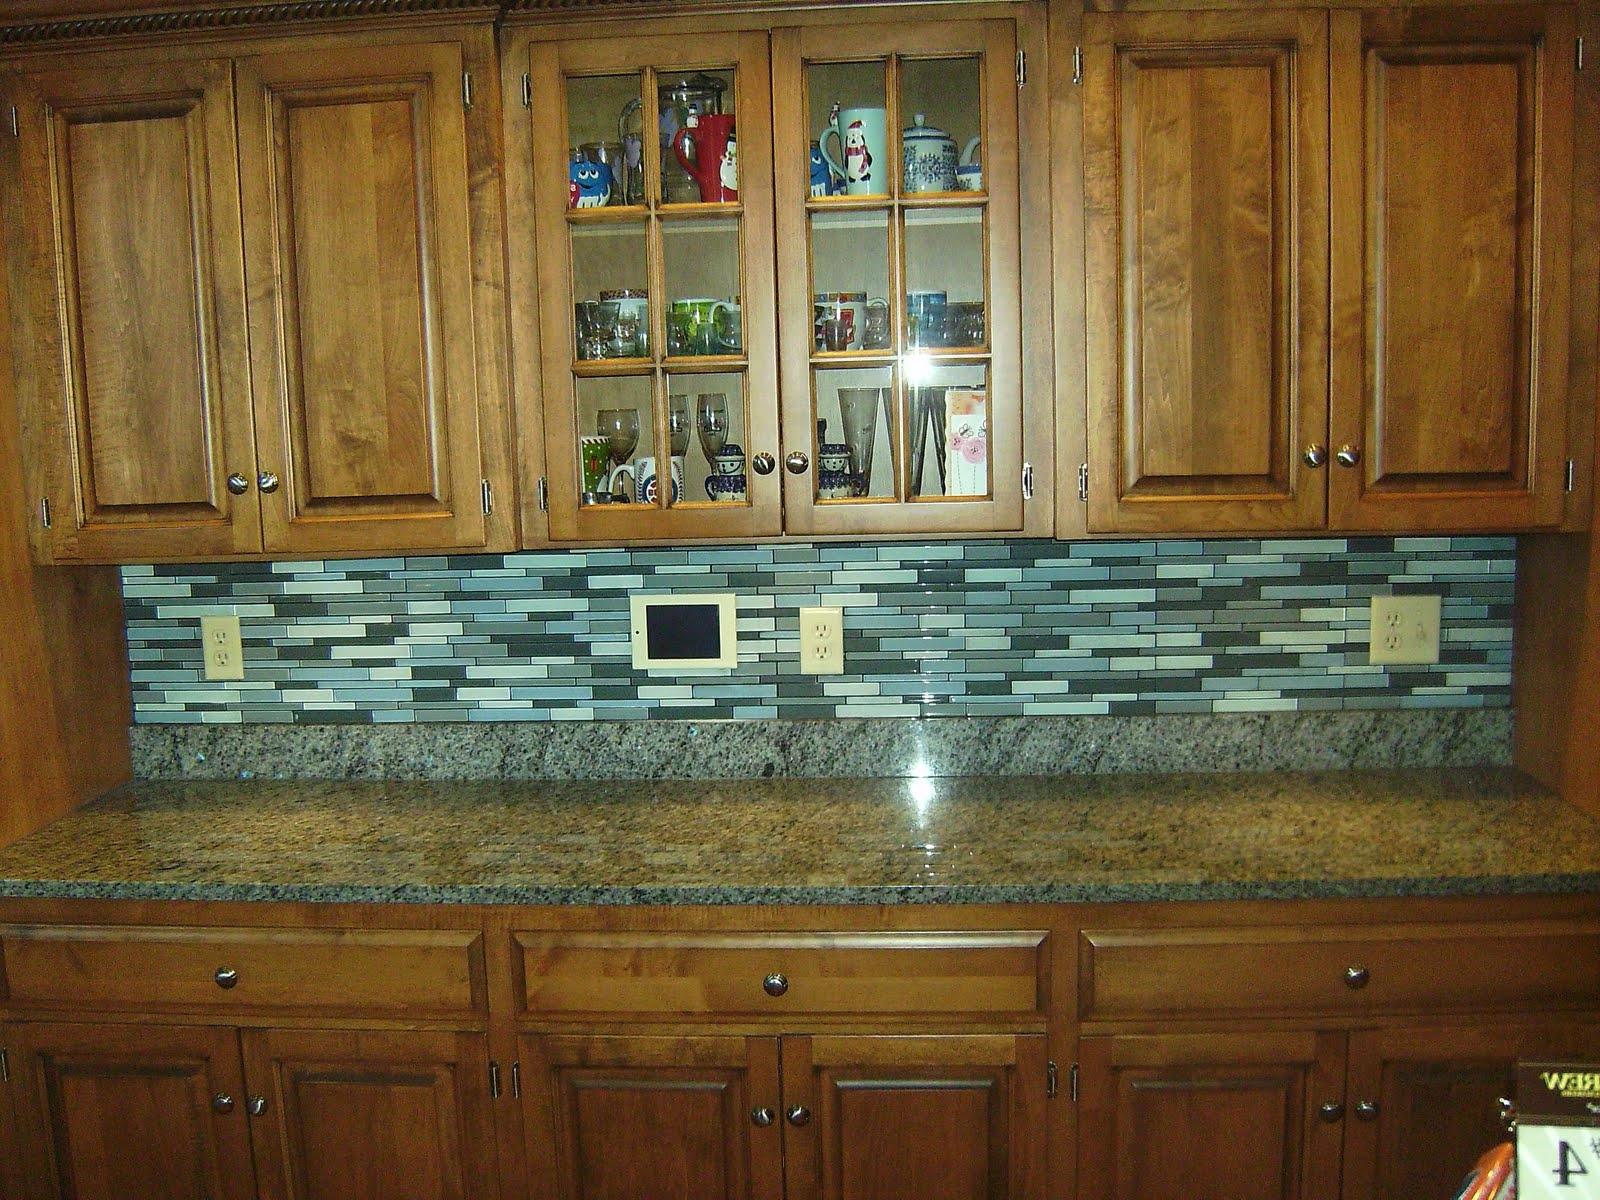 Kitchen Beauty Backsplash Countertops Ceramics Marble Floor Subway Tile For Kitchen Decorations Ornament Ideas Tiles Designs Travertine Color Mosaic Patterns Daltile Backsplashes (Image 26 of 38)